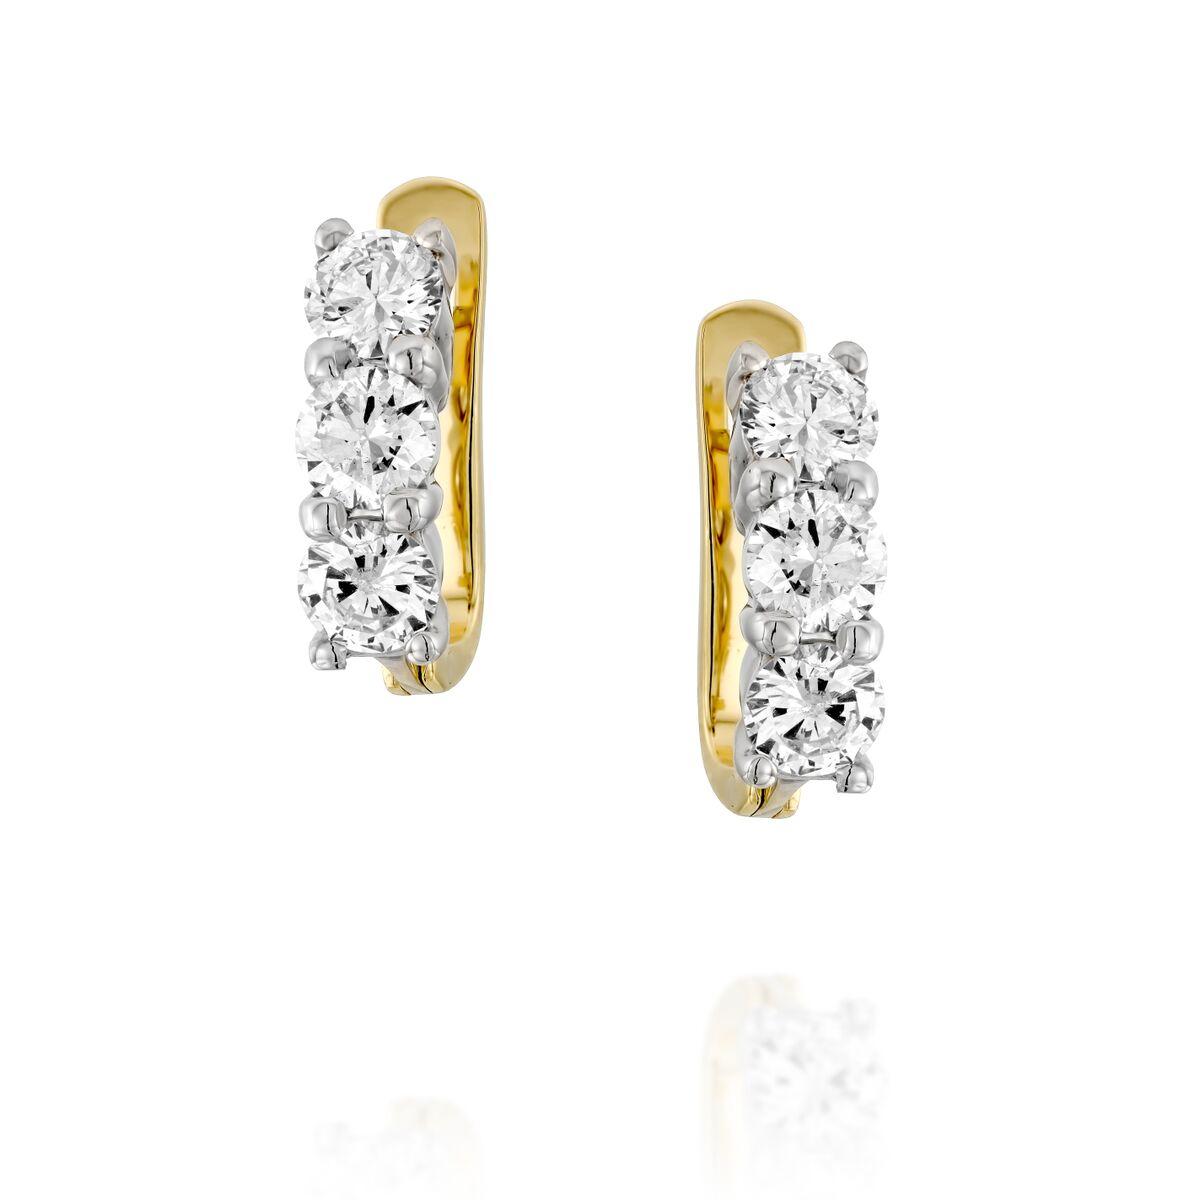 Серьги с бриллиантами 186986